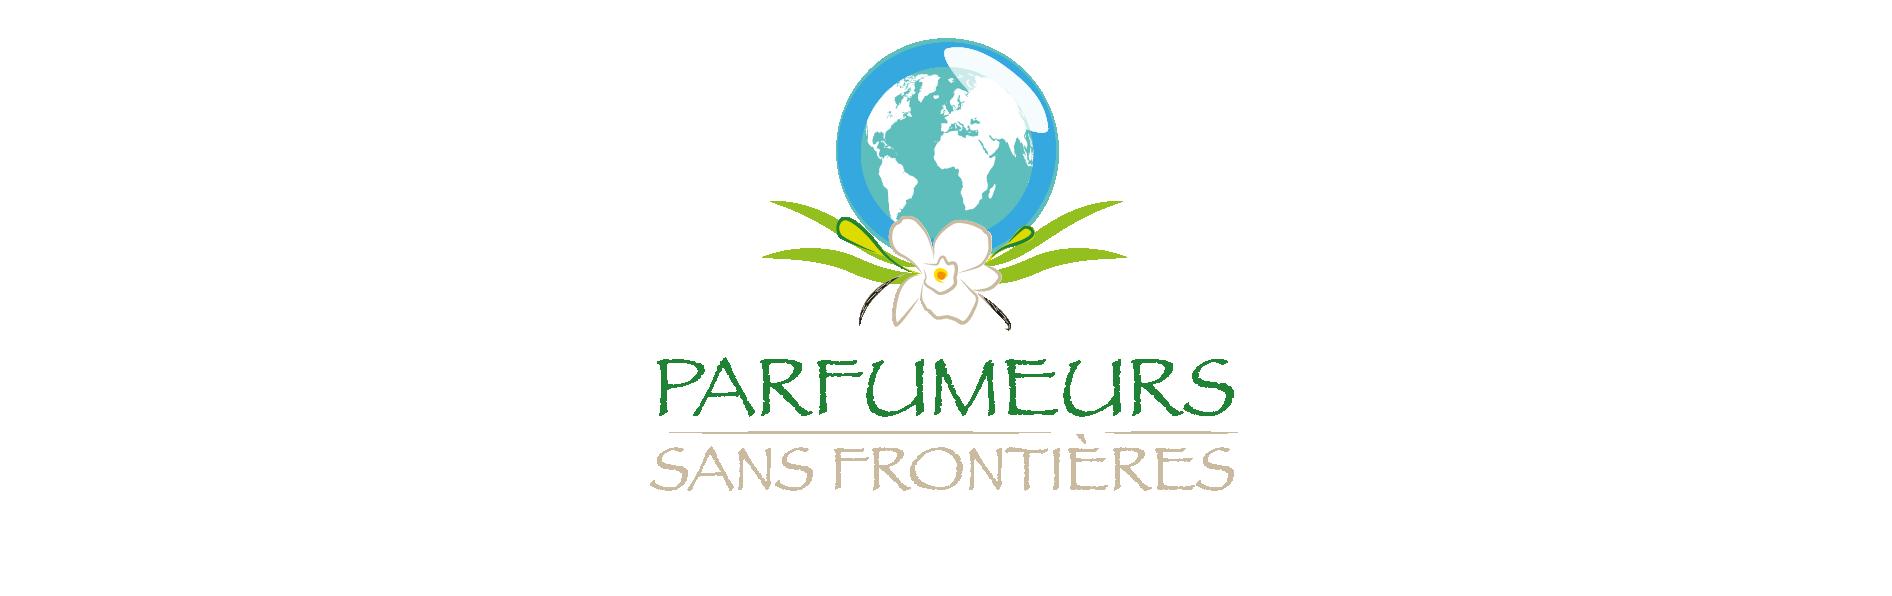 PARFUMEURS-SANS-FRONTIERES-LOGO